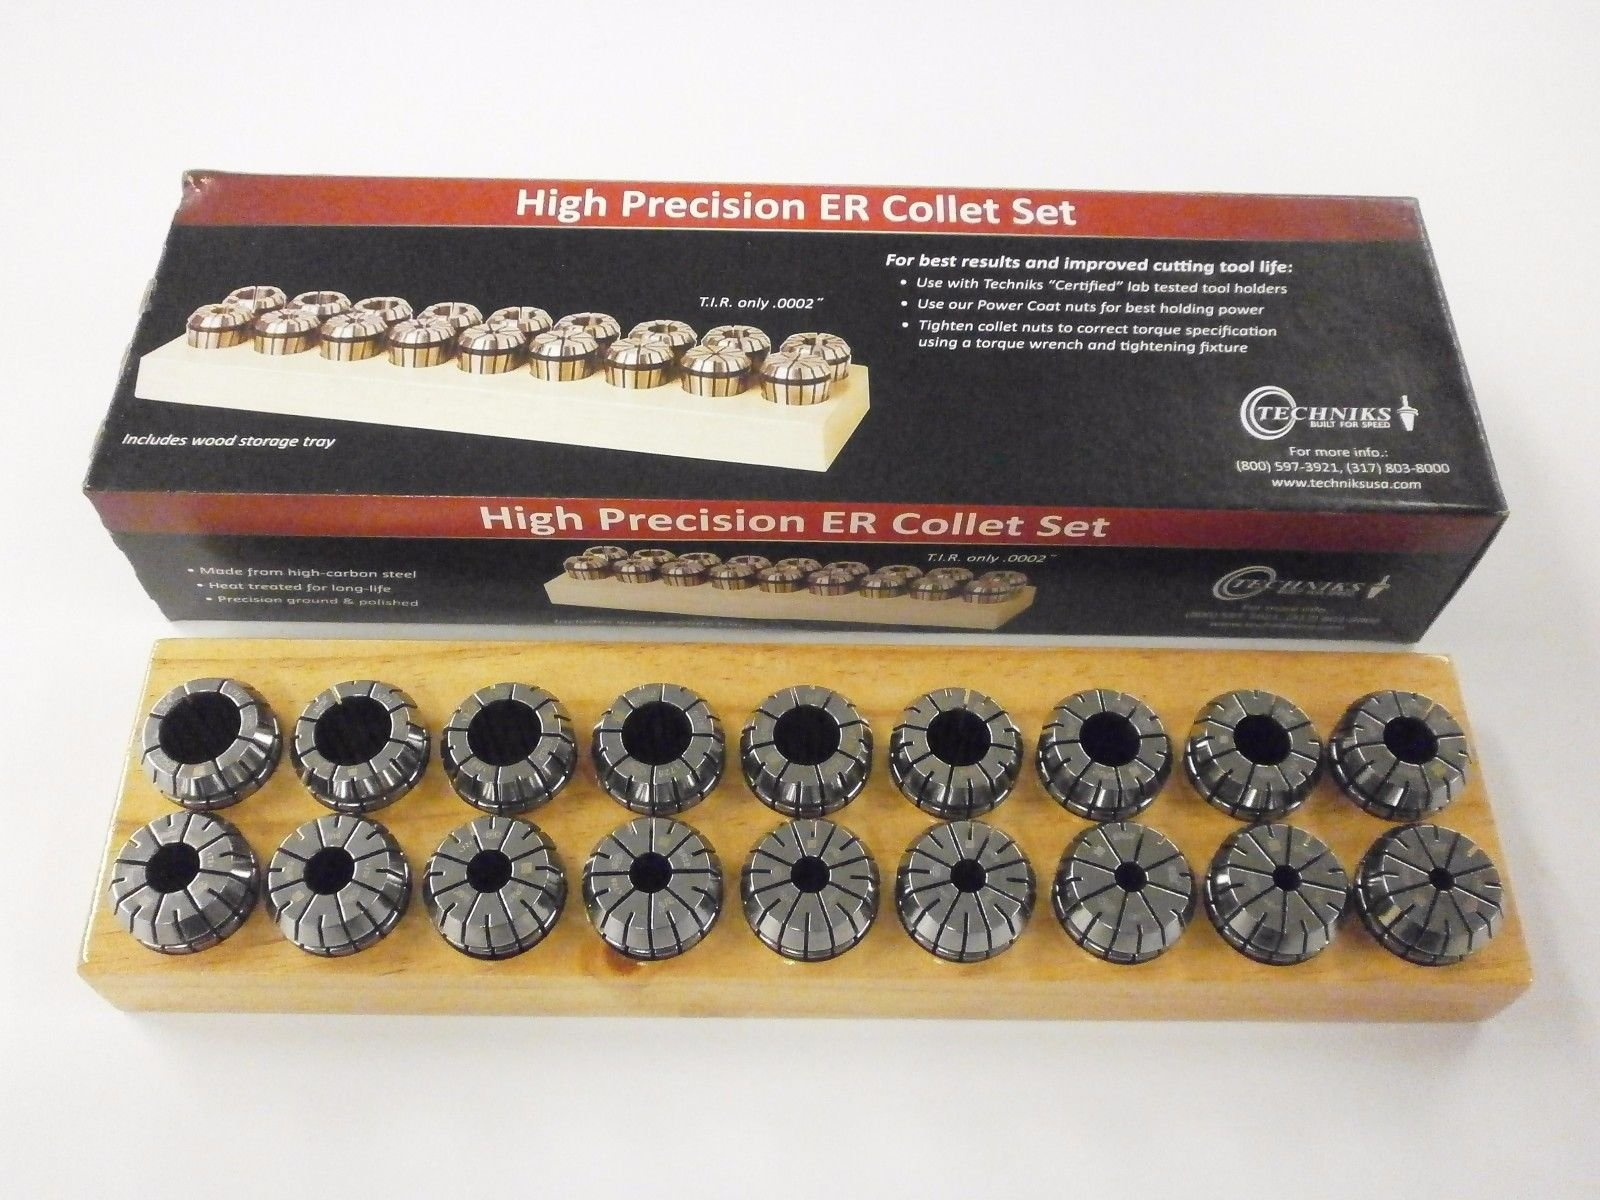 Techniks ER32 Precicion Metric Collet Set 18 Piece -04205MS (3mm - 20mm by 1mm) Average .0002'' TIR, .039'' Collapse Range, CNC Tooling SYIC